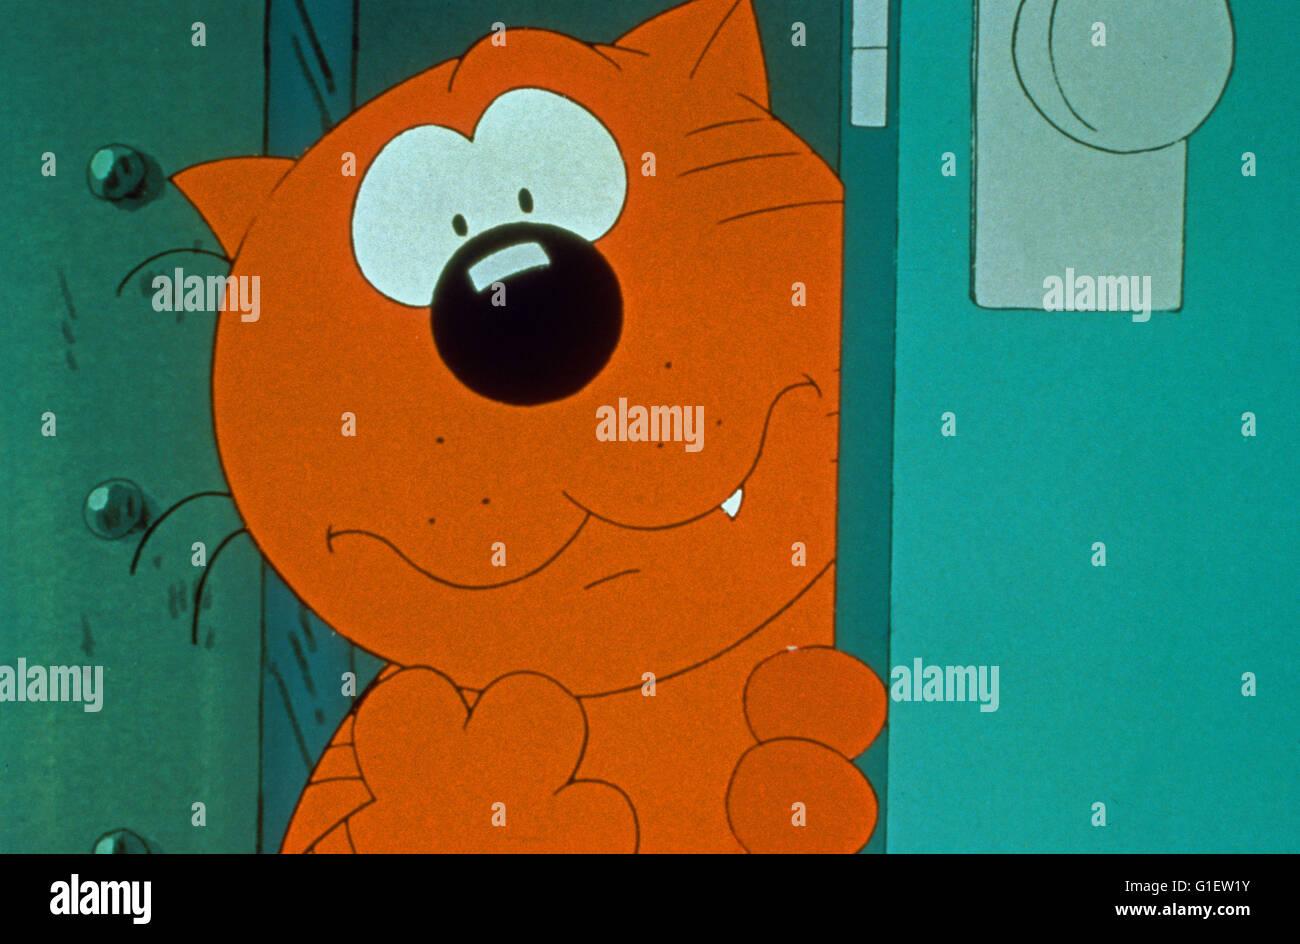 Heathcliff e a Catillac gatos, aka: Heathcliff und Riff Raff, Zeichentrickserie, EUA/Frankreich/Kanada/Japão Imagens de Stock